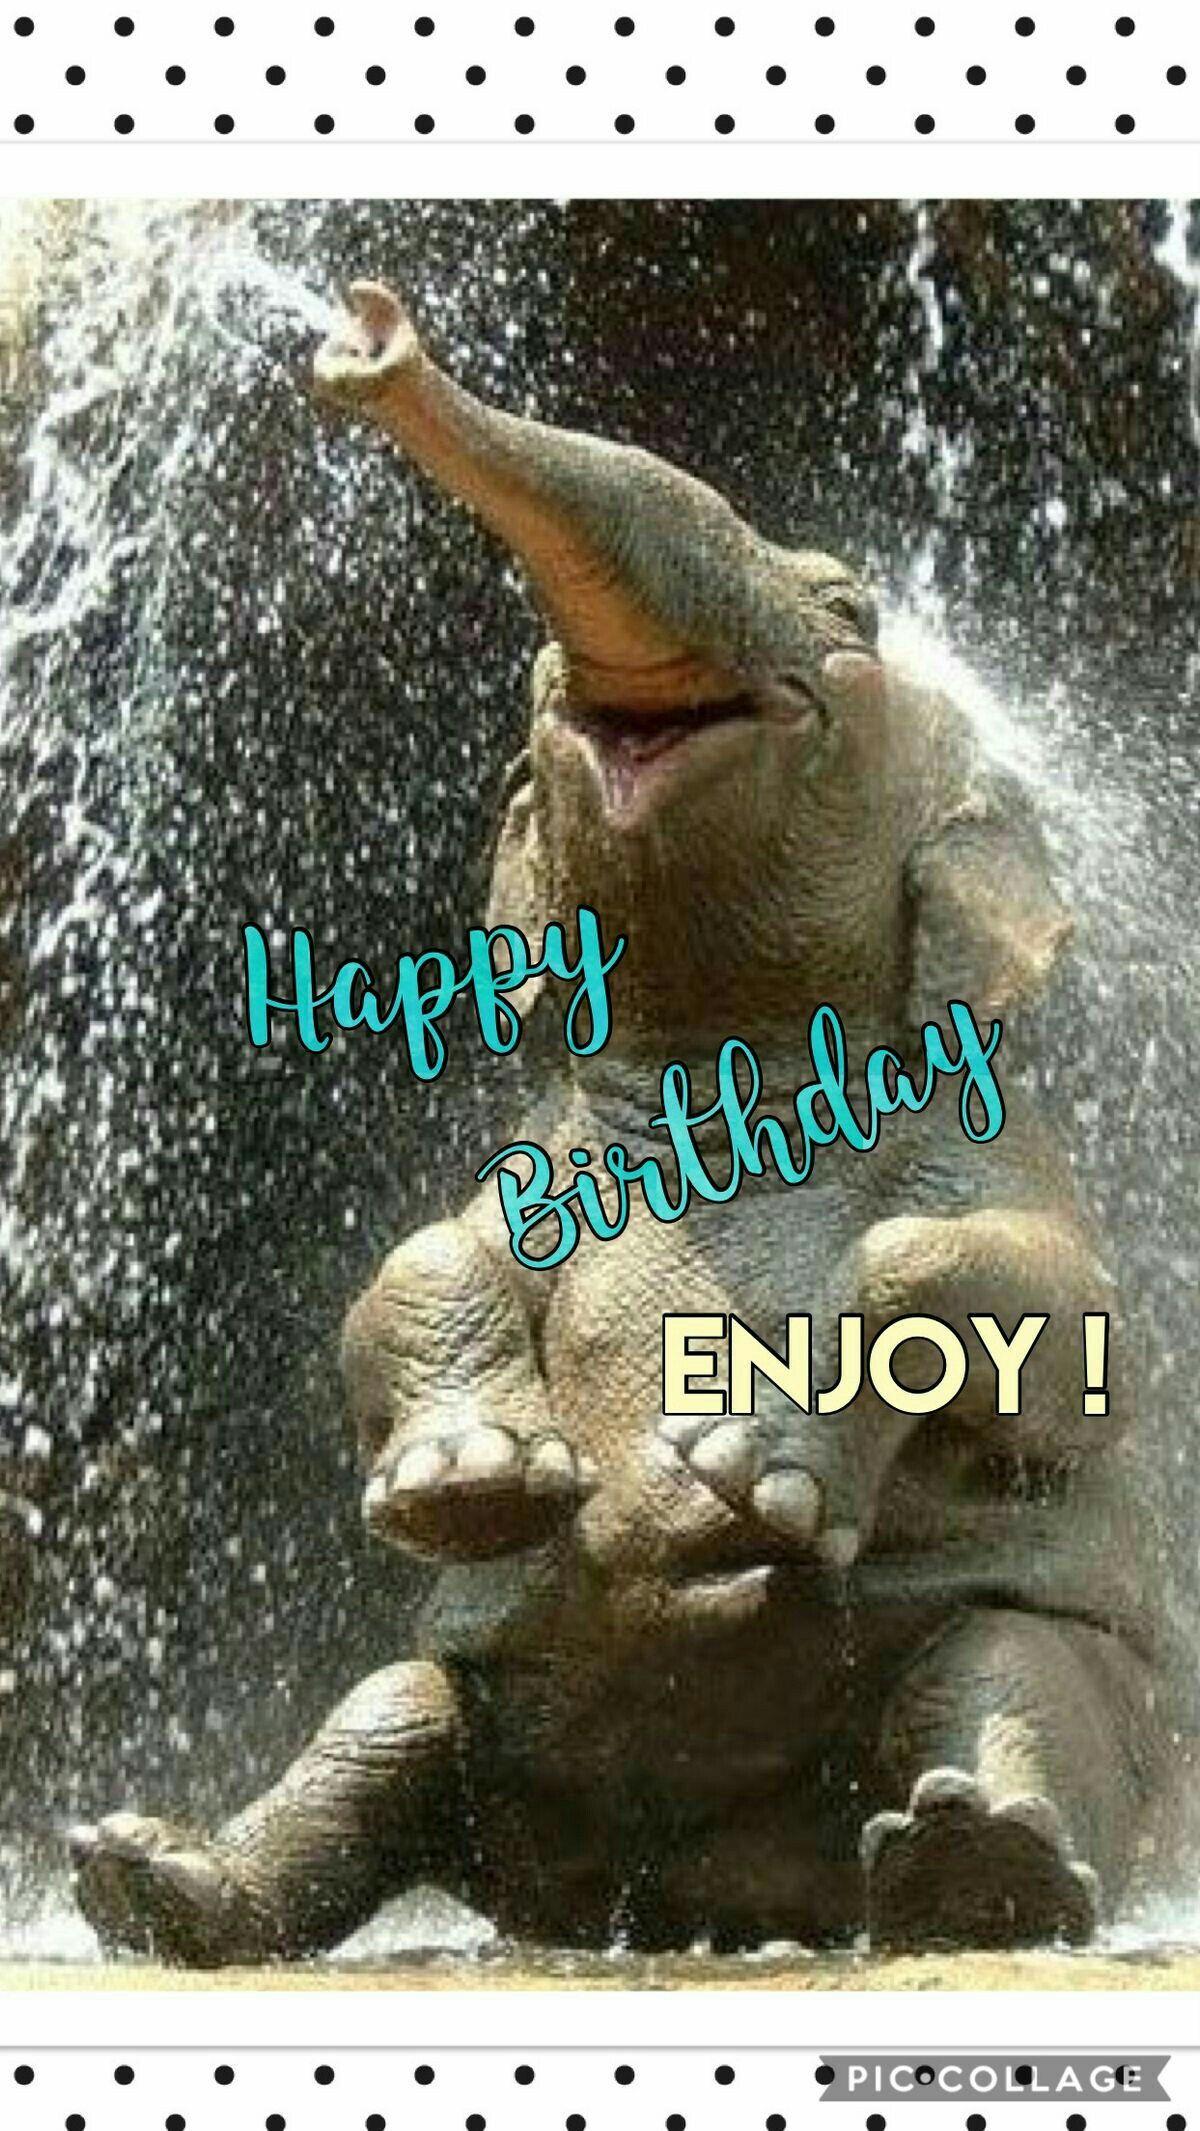 Happy Birthday Elephant Birthday Greetings Funny Funny Happy Birthday Wishes Happy Birthday Brother